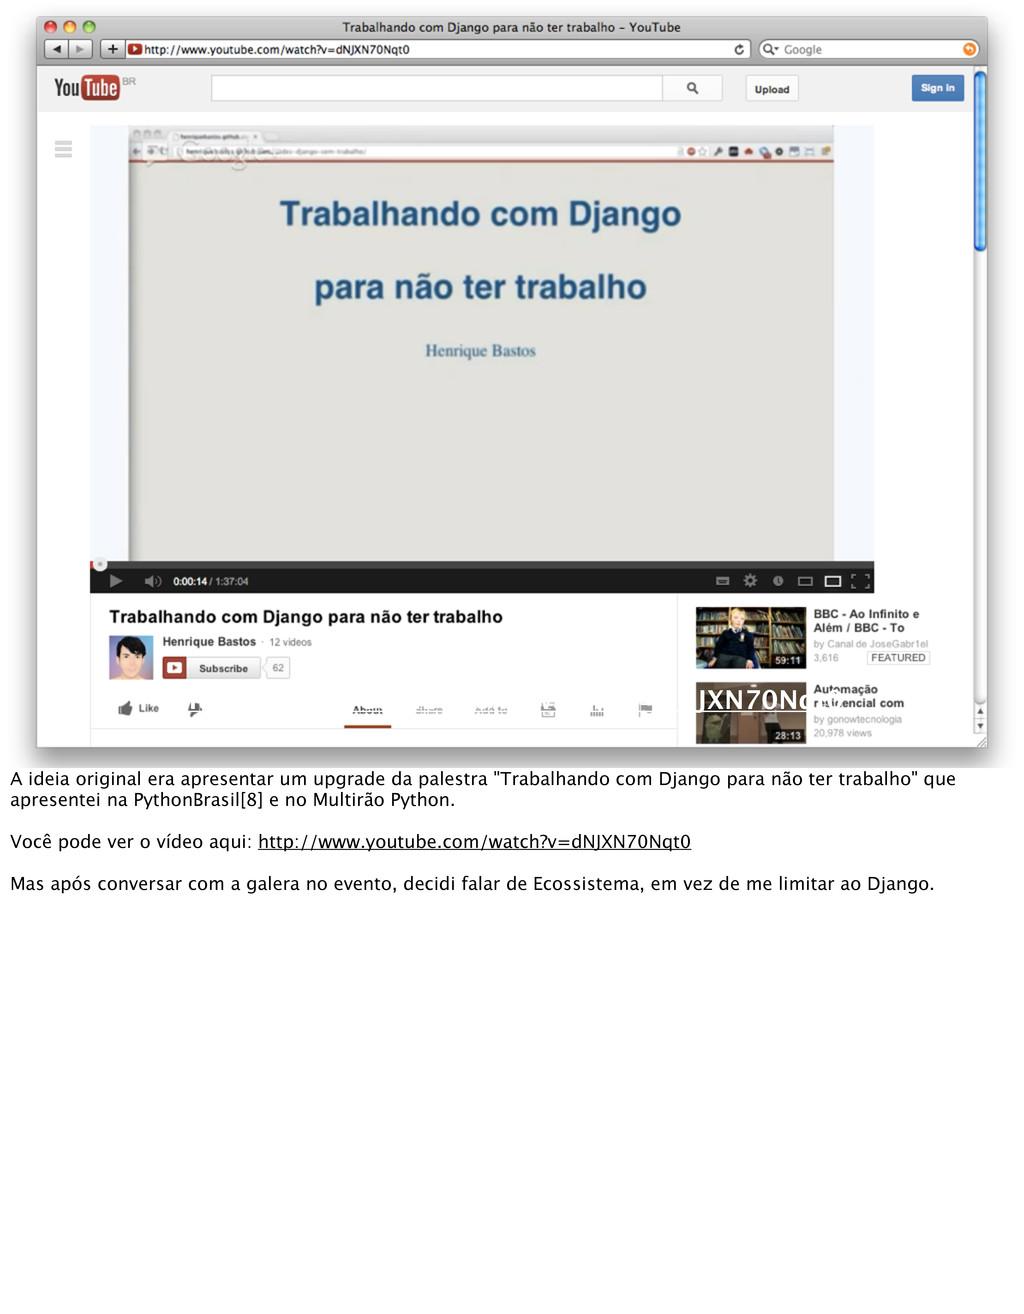 http://www.youtube.com/watch?v=dNJXN70Nqt0 A id...